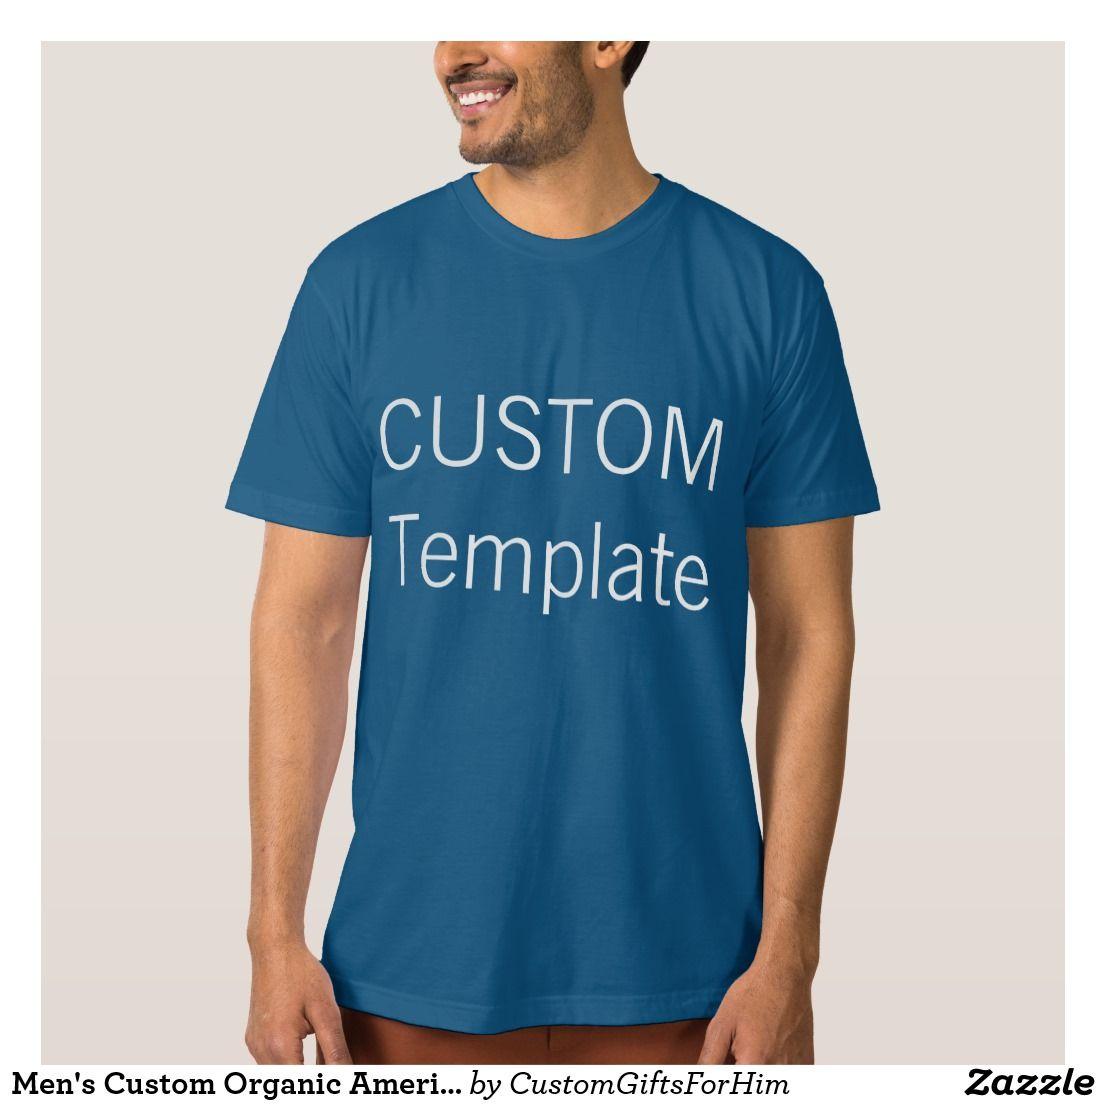 Design your own eco-friendly t-shirt - Men S Custom Organic American Apparel T Shirt